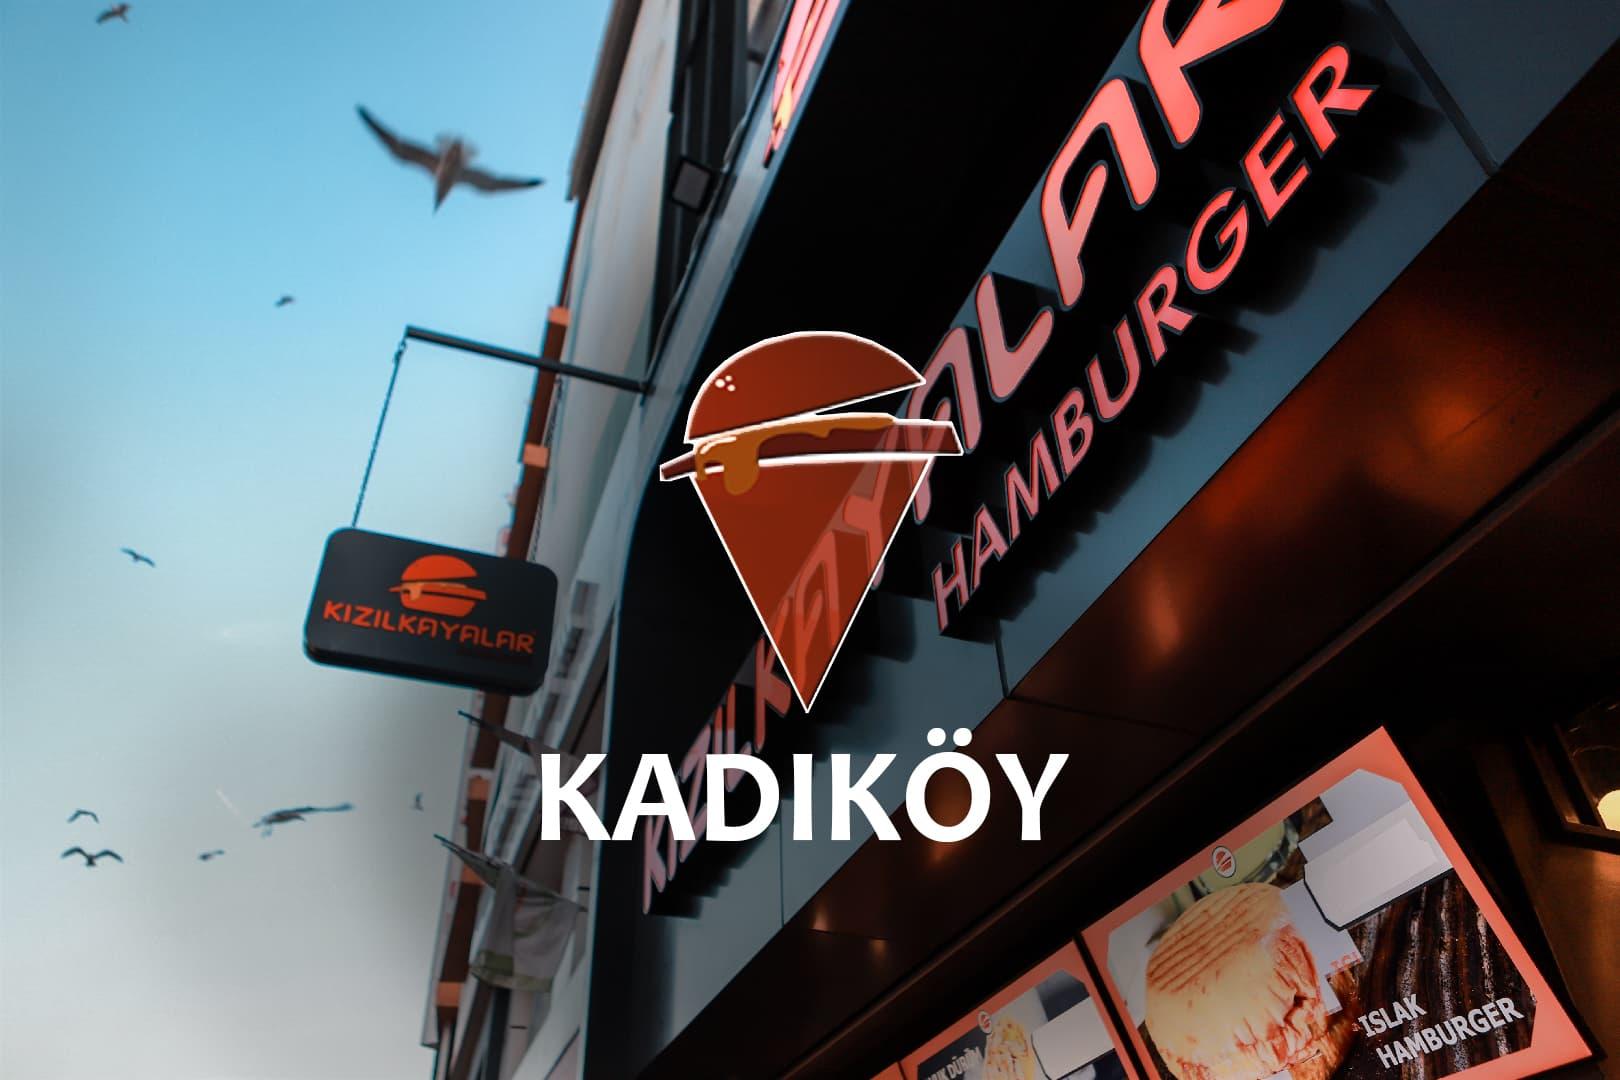 Kızılkayalar Kadıköy فرع شجرة